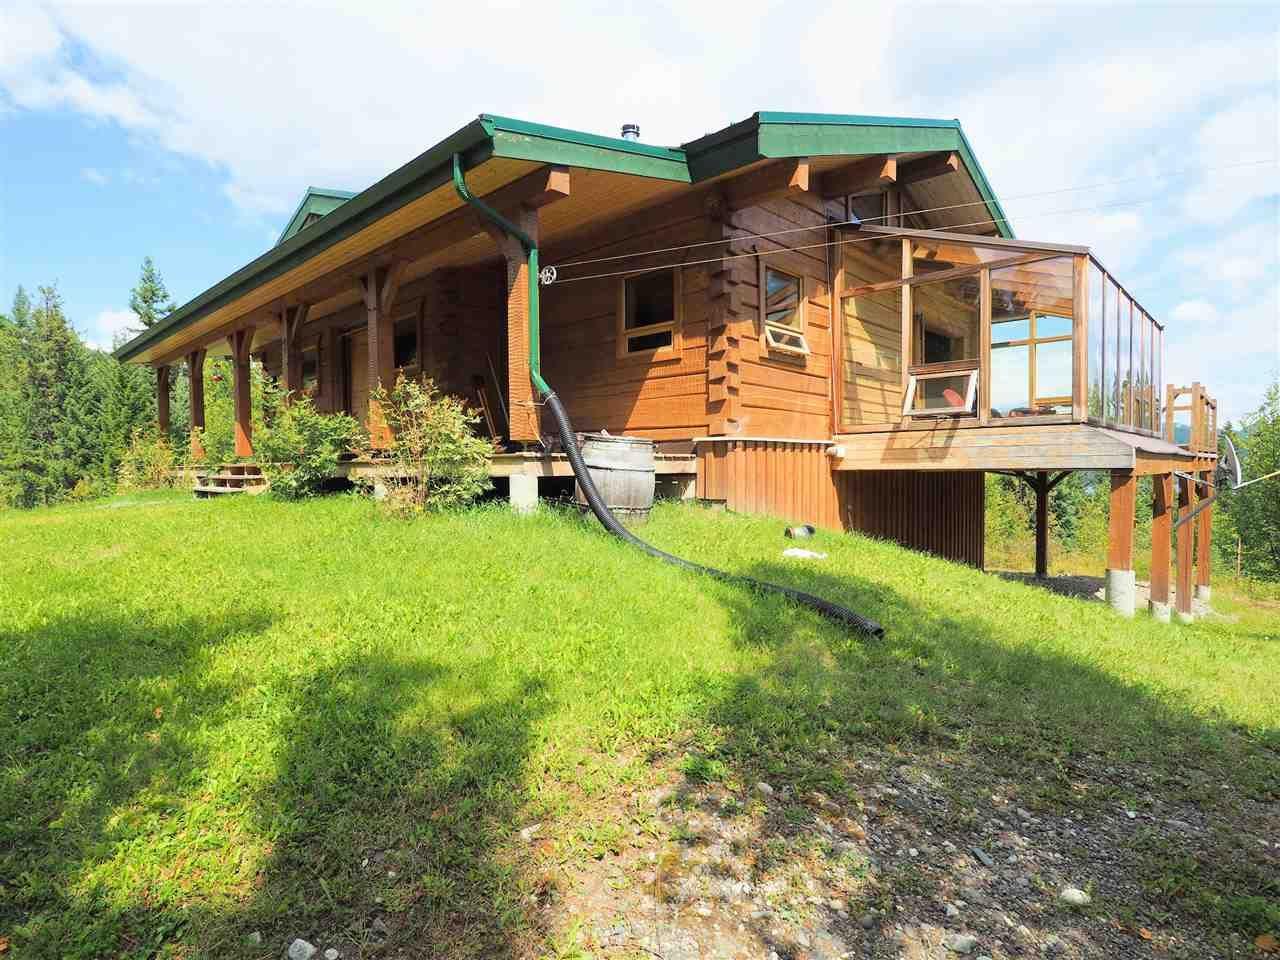 Main Photo: 4050 CANIM-HENDRIX LAKE Road in Canim Lake: Canim/Mahood Lake House for sale (100 Mile House (Zone 10))  : MLS®# R2396282